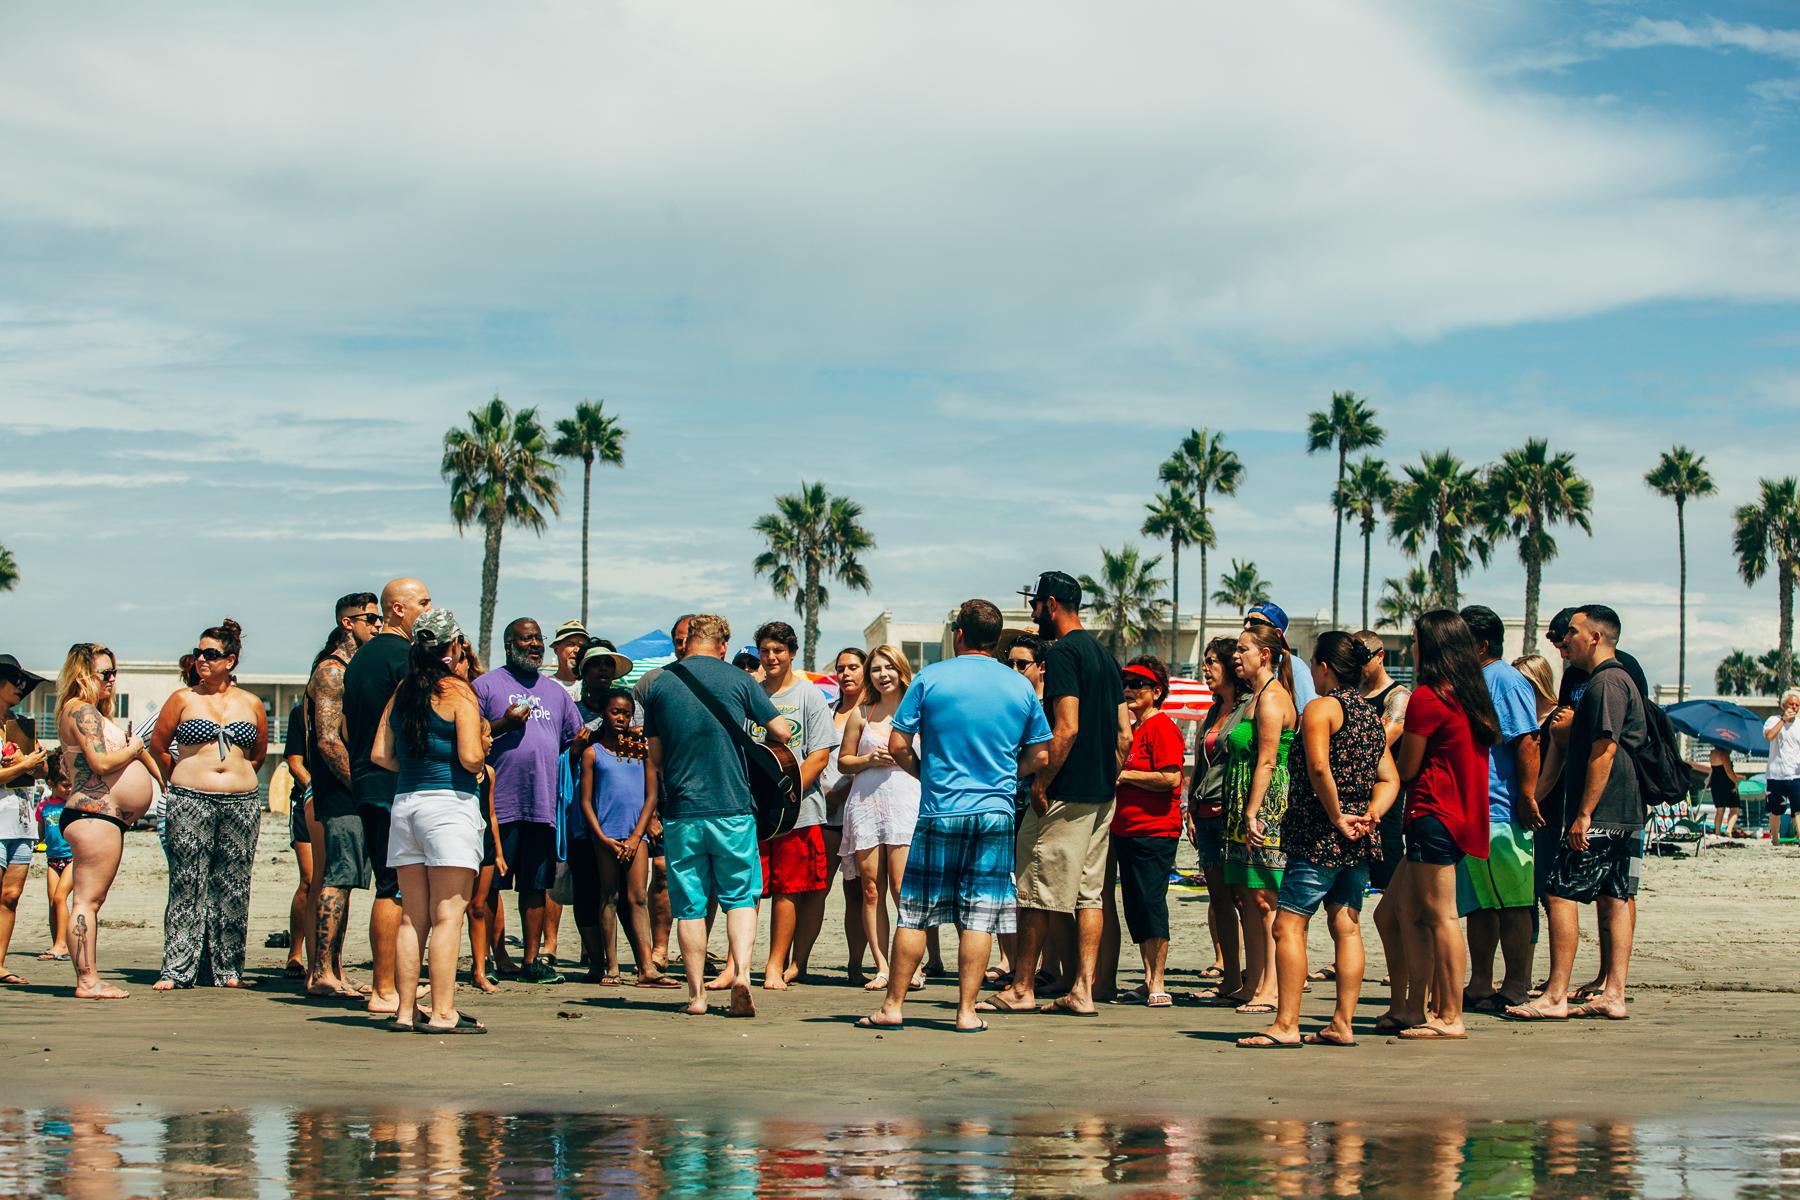 Beach_Baptism_2015_14.jpg